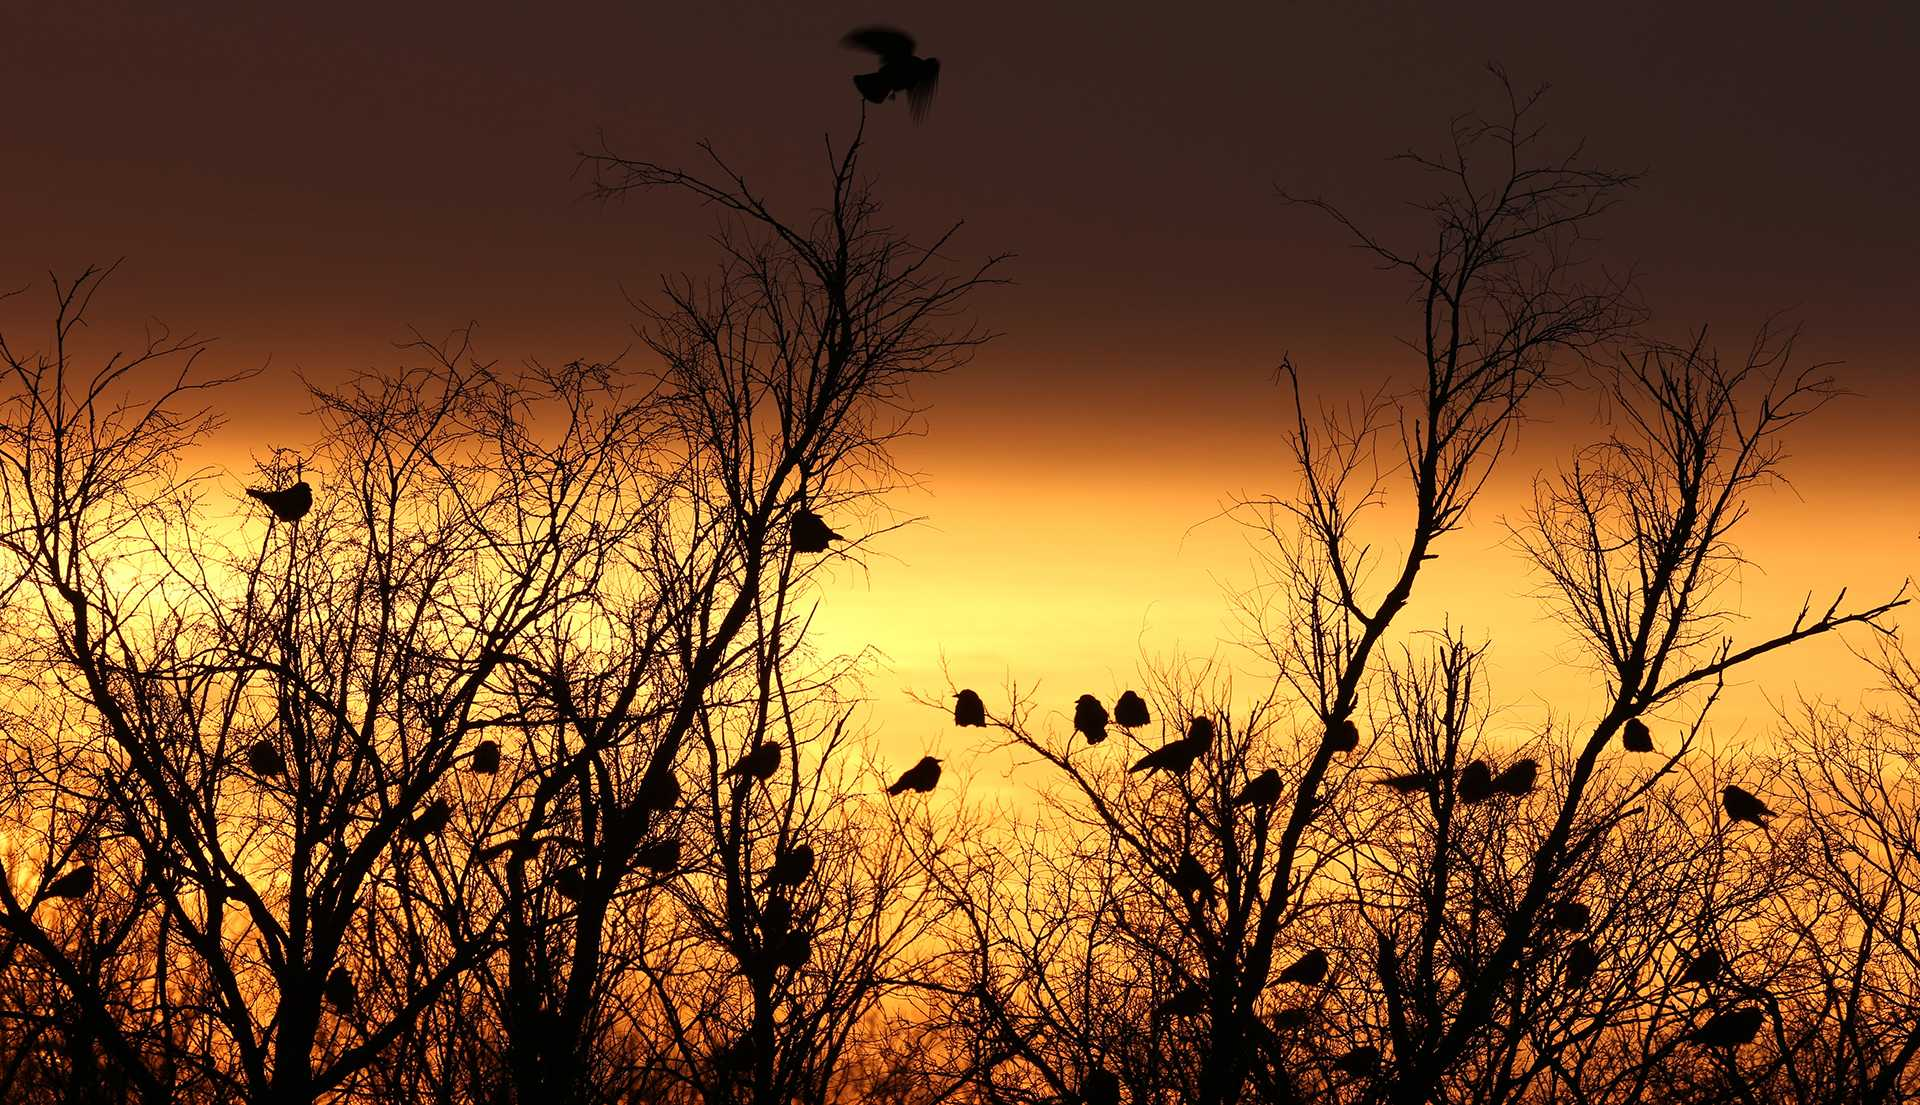 Crows flock along the Vermillion River in Danville, Illinois, January 24, 2013. (E. Jason Wambsgans/Chicago Tribune/MCT)